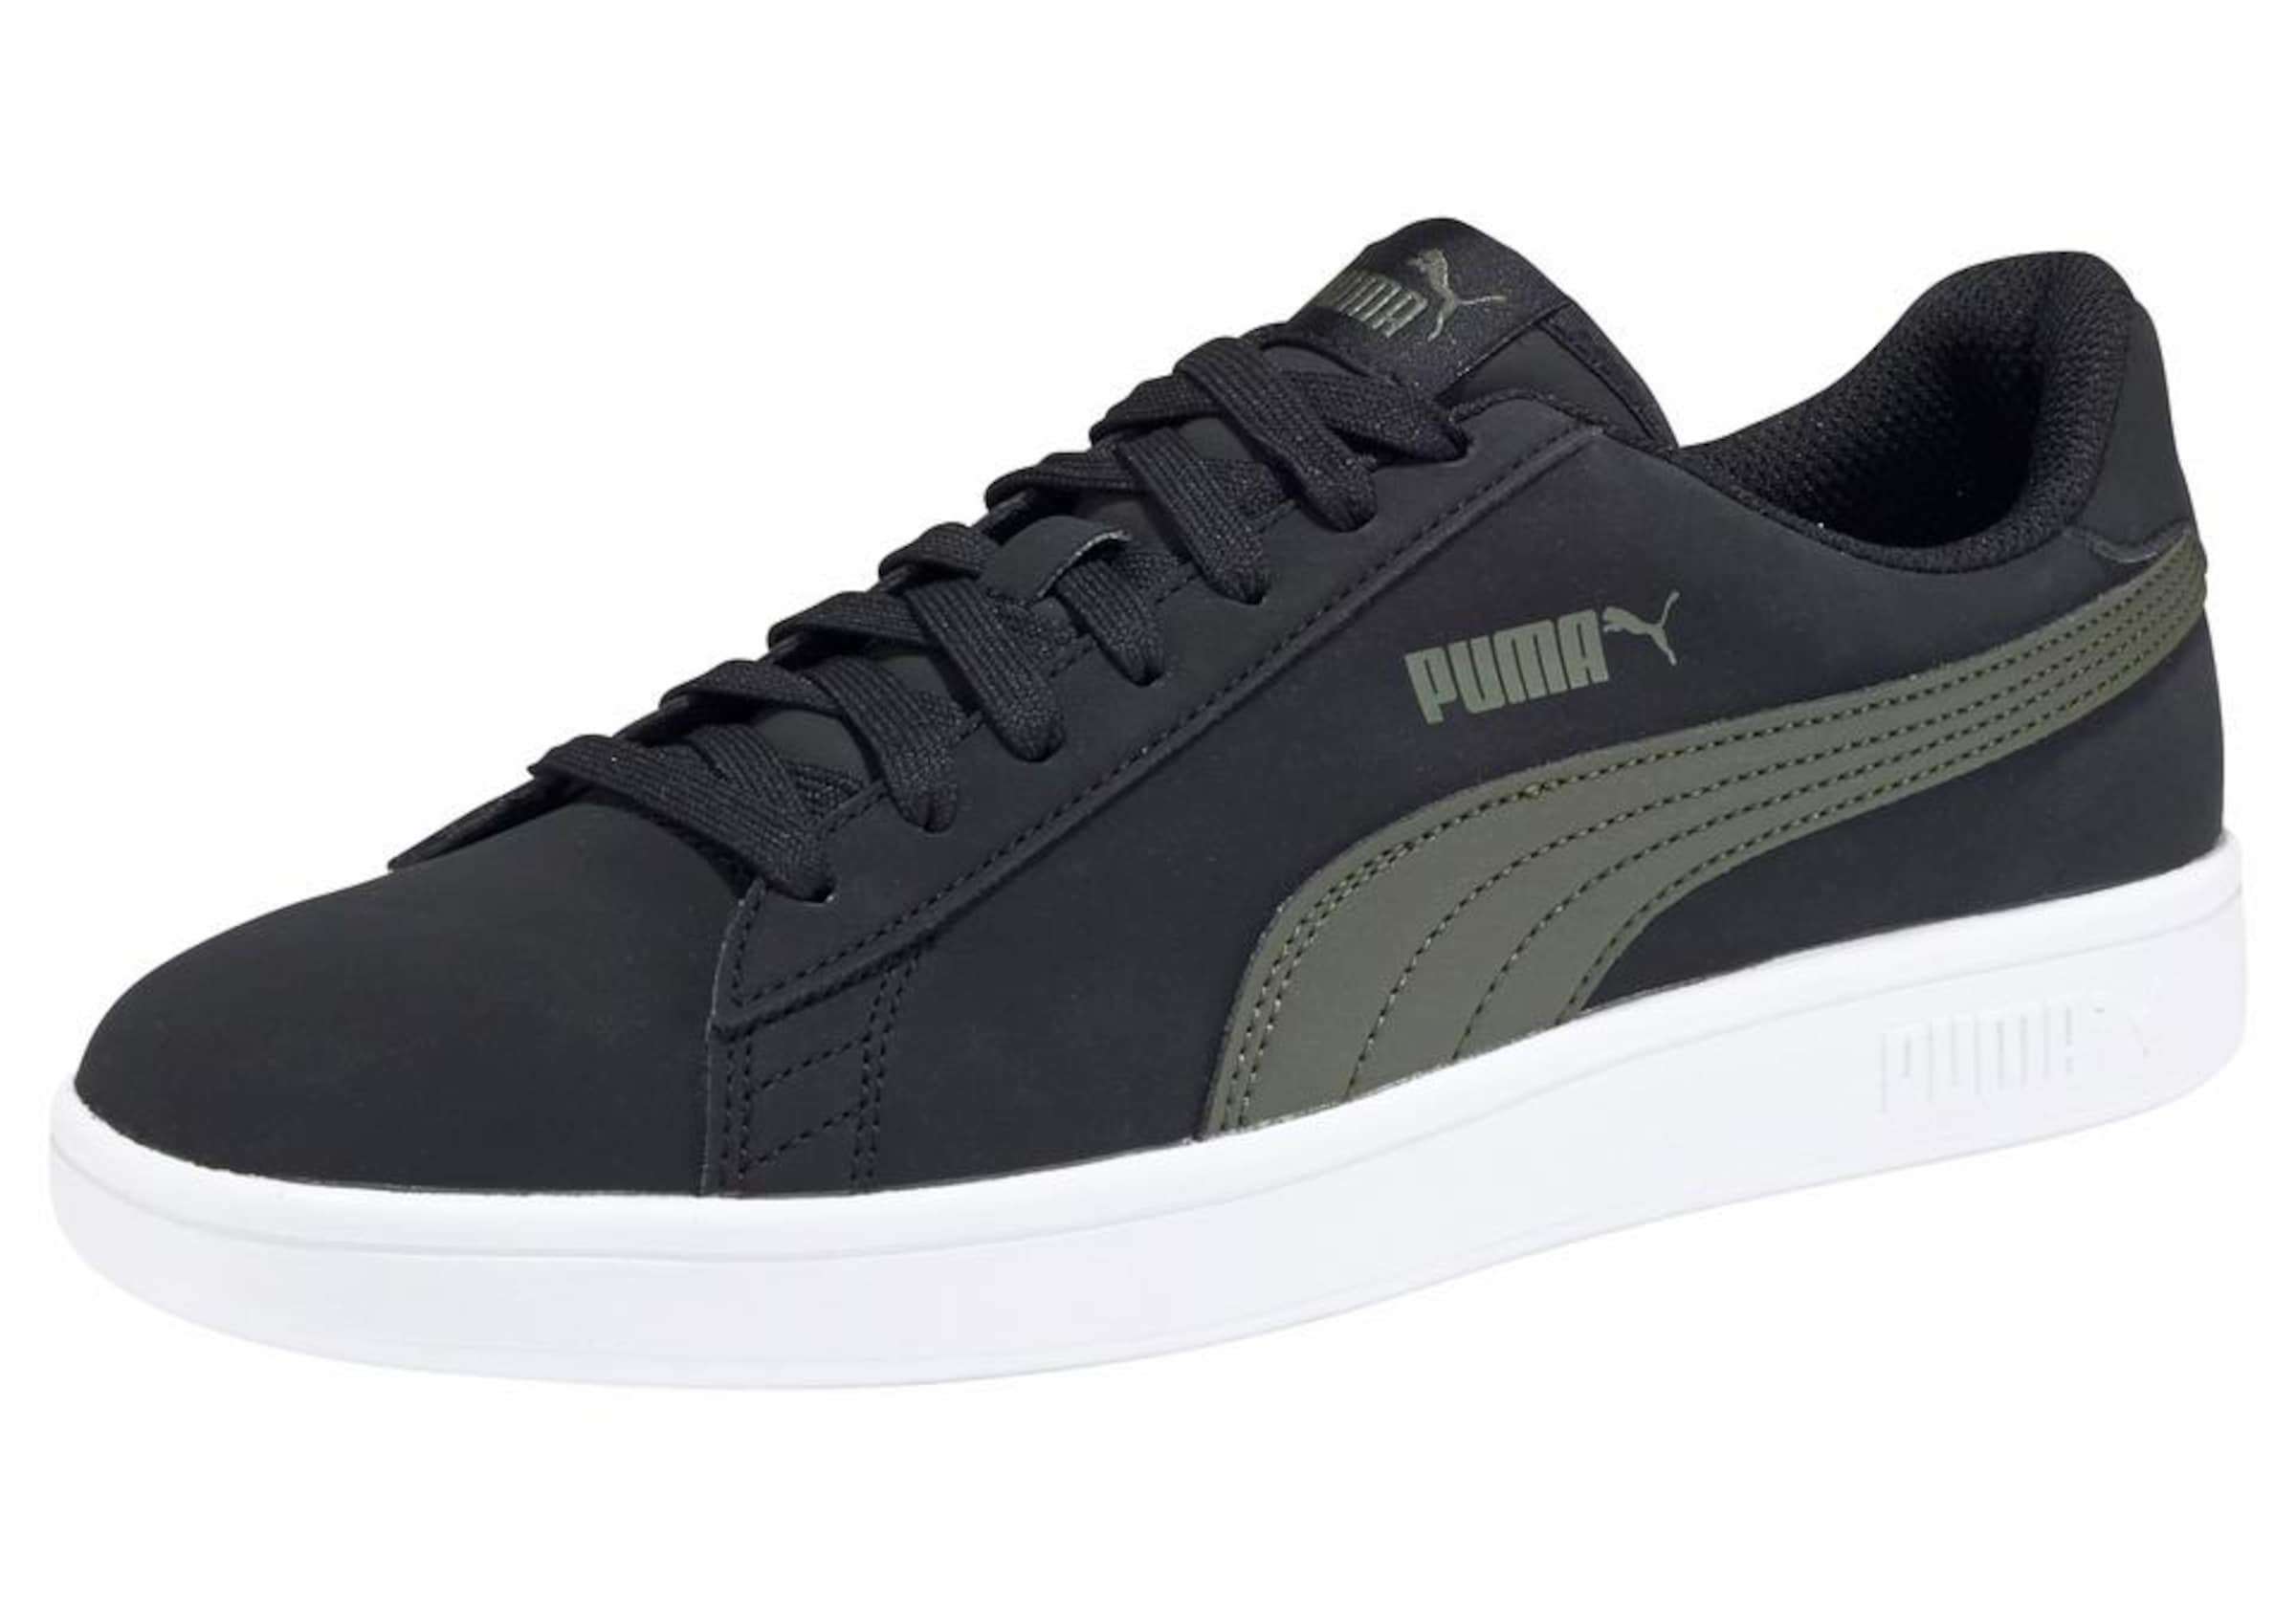 V2 Sneaker 'smash Buck' KhakiSchwarz Weiß In Puma Yvbf7y6g